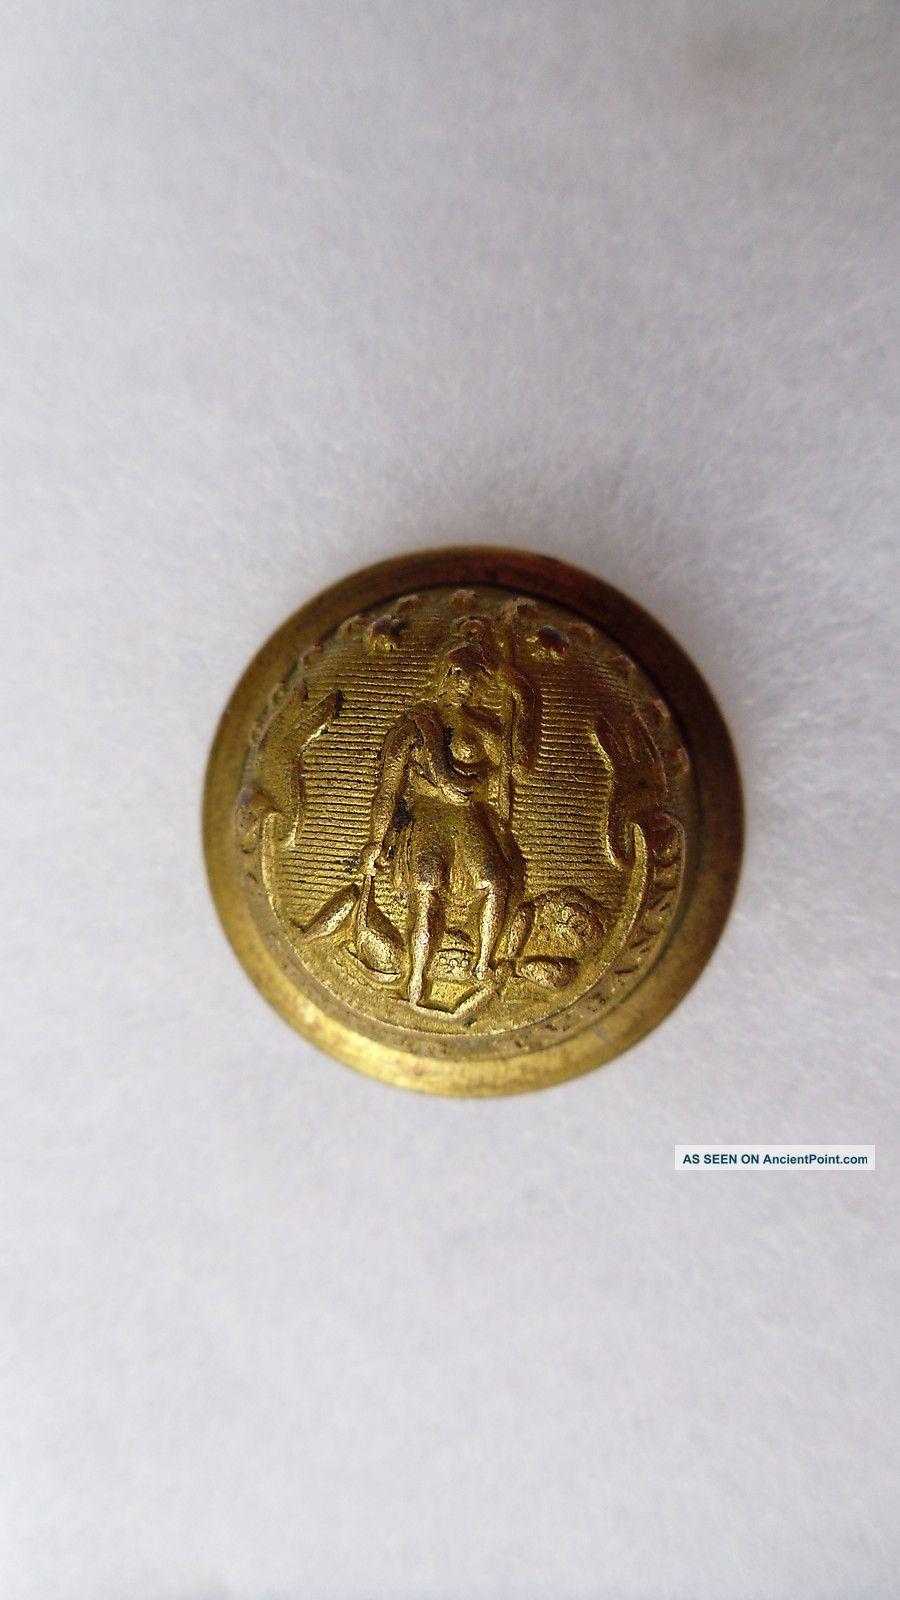 Antique Virginia State Seal Coat Button Horstmann Philadelphia 23 Mm Buttons photo